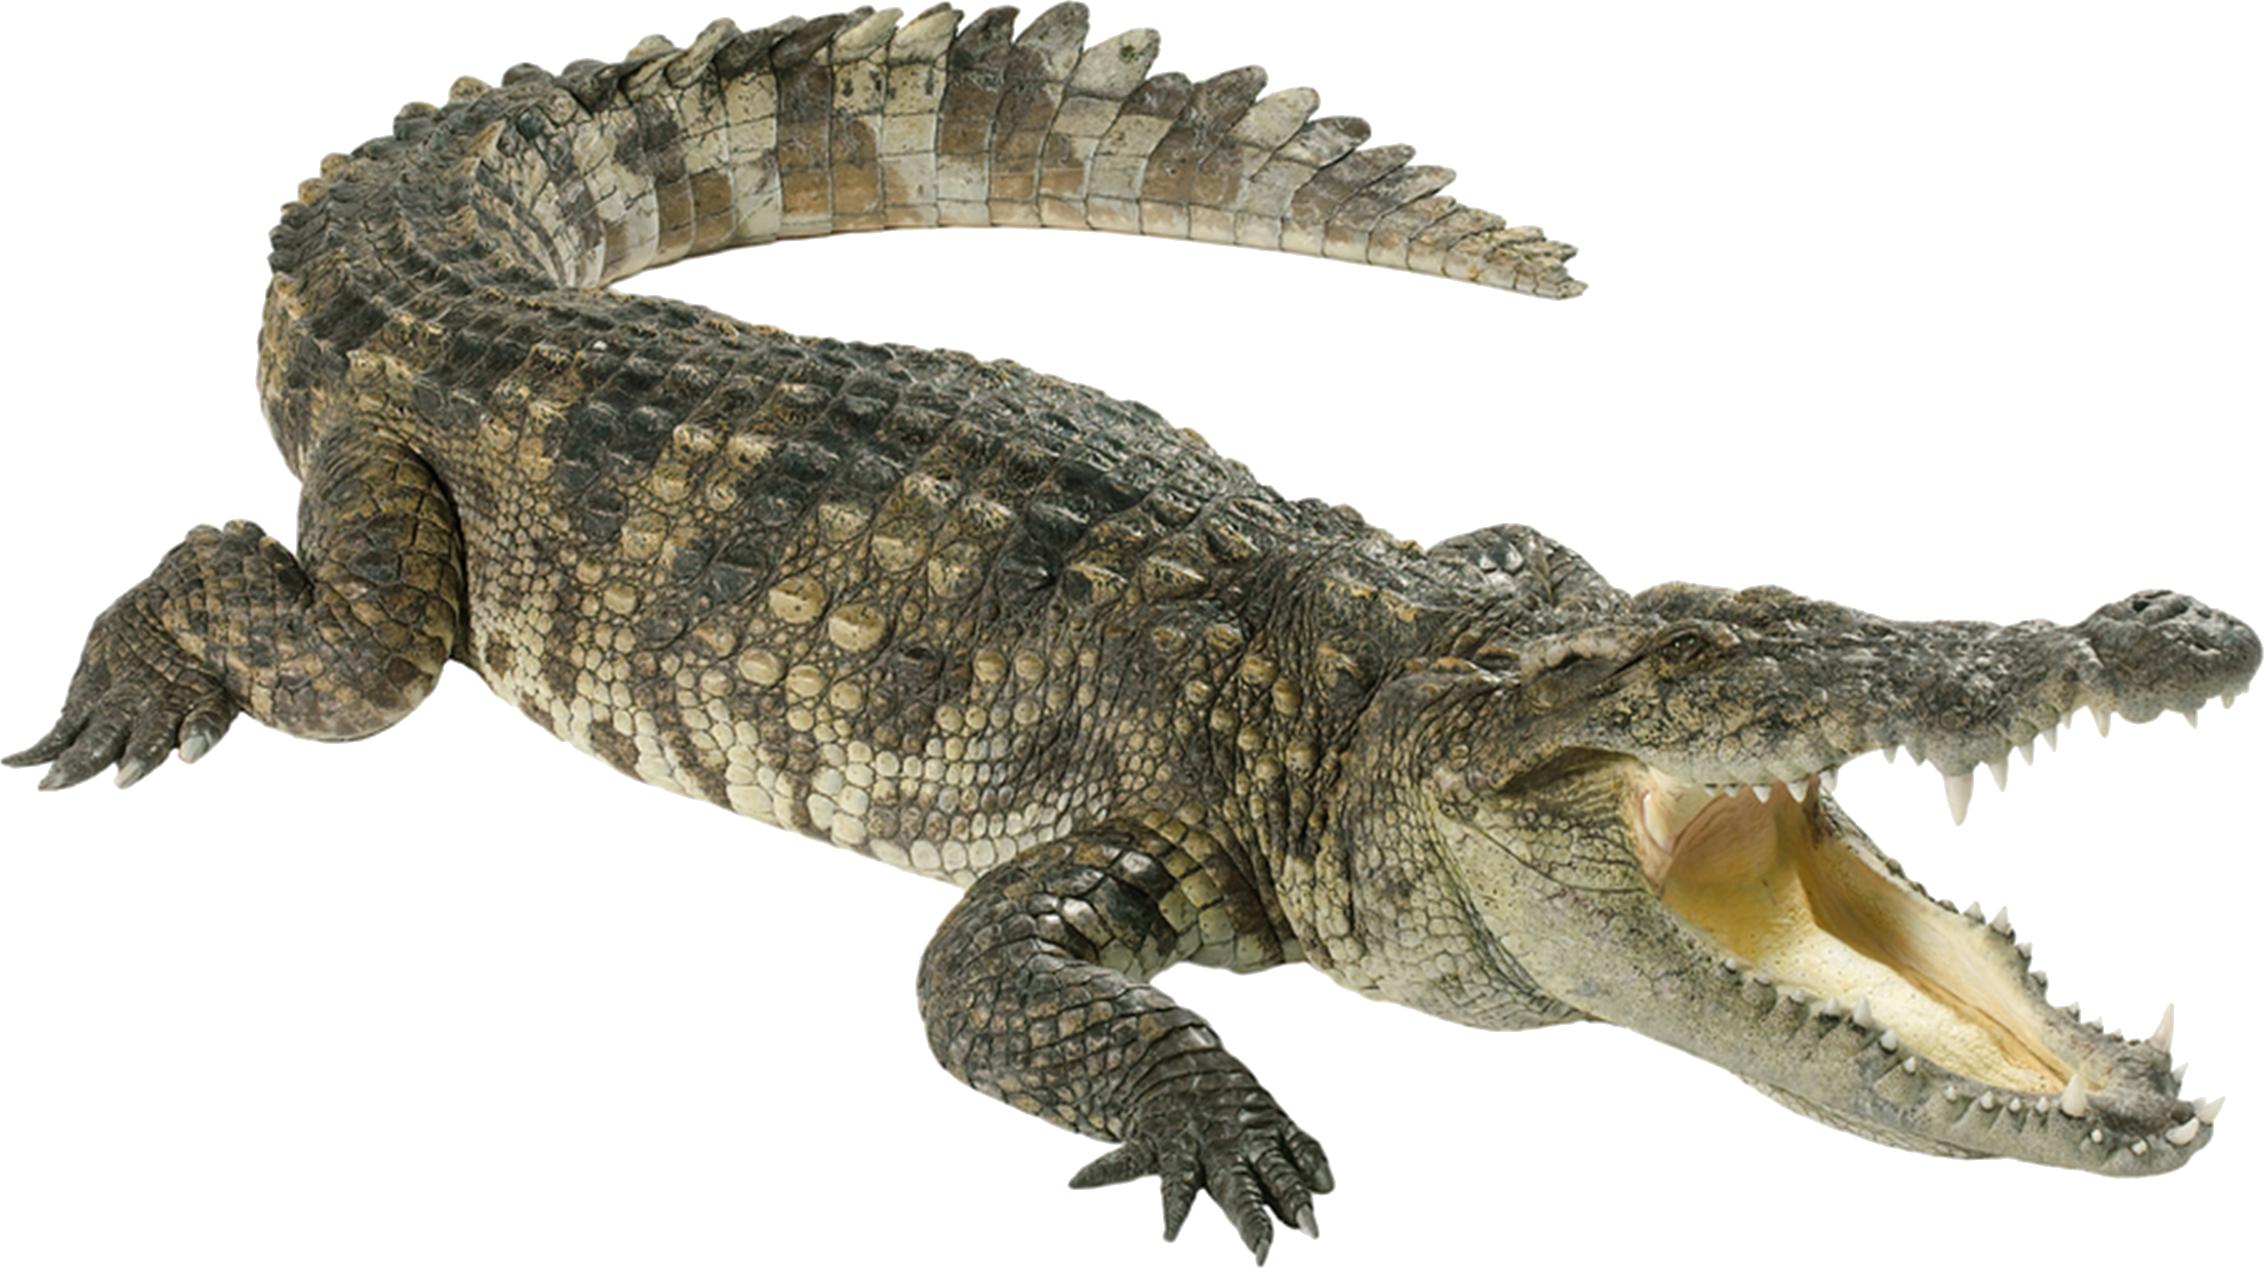 Green Crocodile PNG Image.